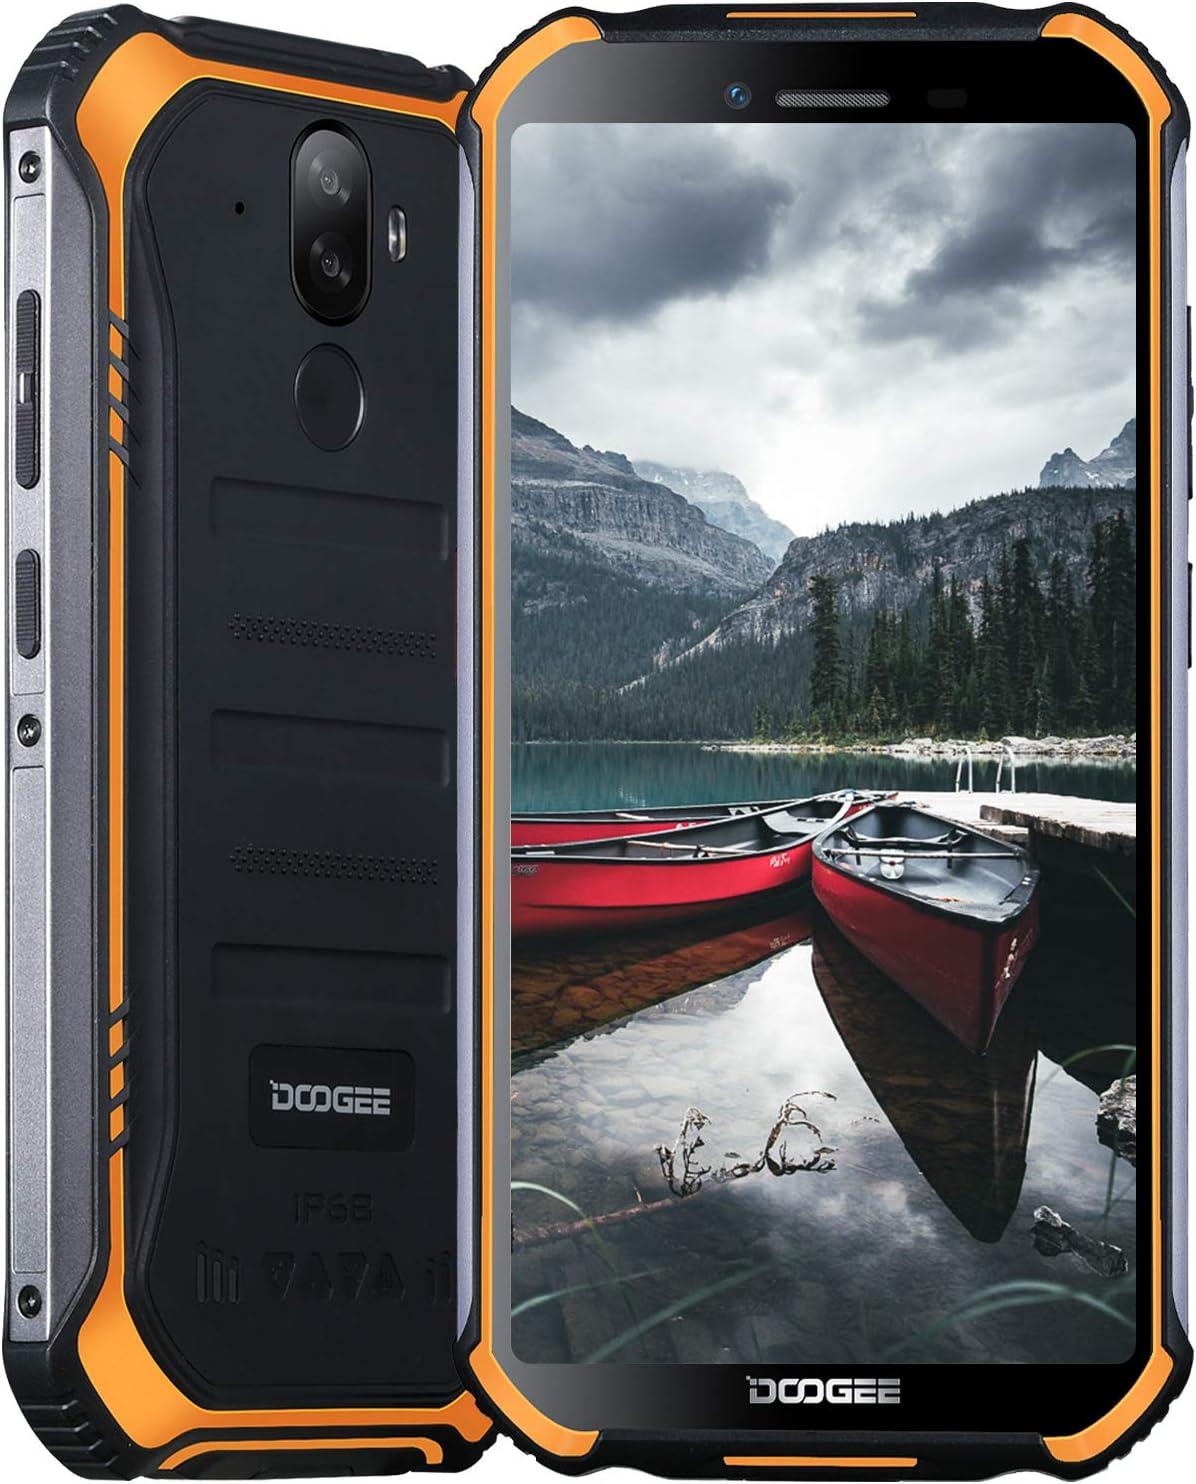 Móviles Libres, DOOGEE S40 Pro Móvil Resistente, 4GB + 64GB(SD 256GB), Cámara 13MP+2MP, Cámara Frontal 5MP, 4650mAh Movil Antigolpes, Android 10 Smartphone 4G de 5.45